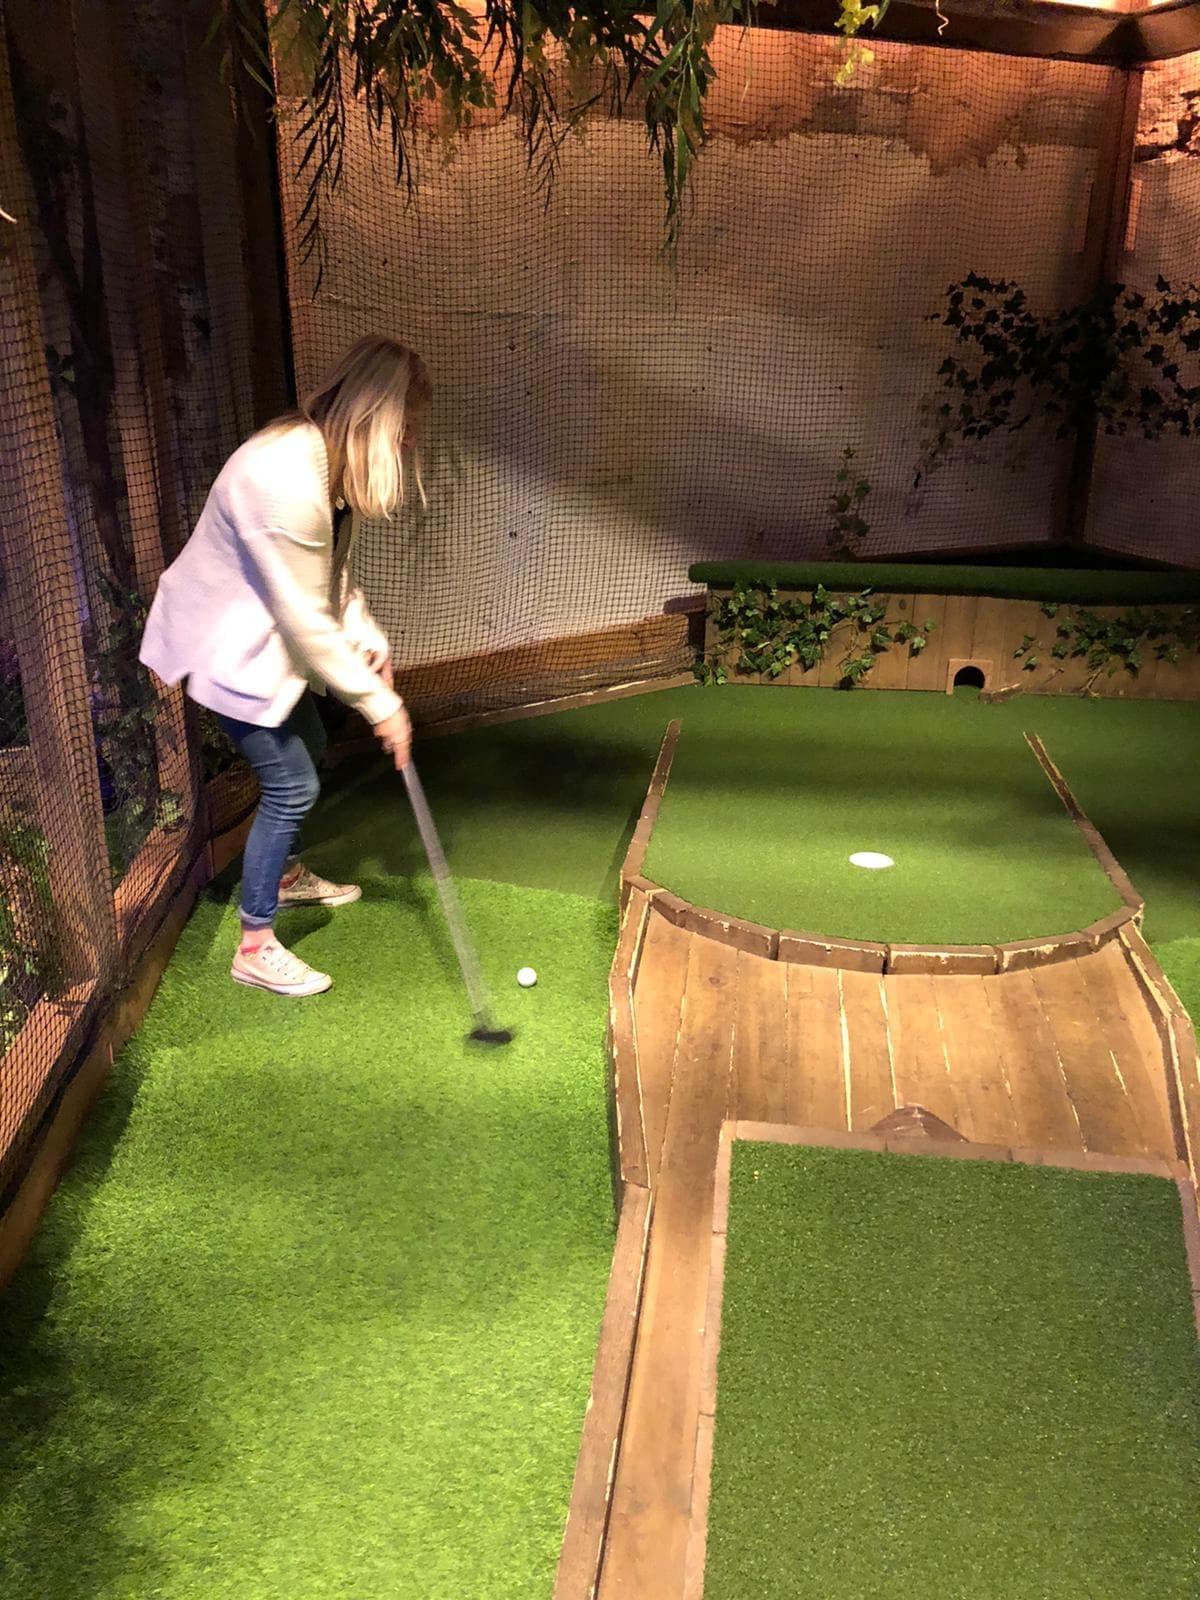 Swingers London mini golf course